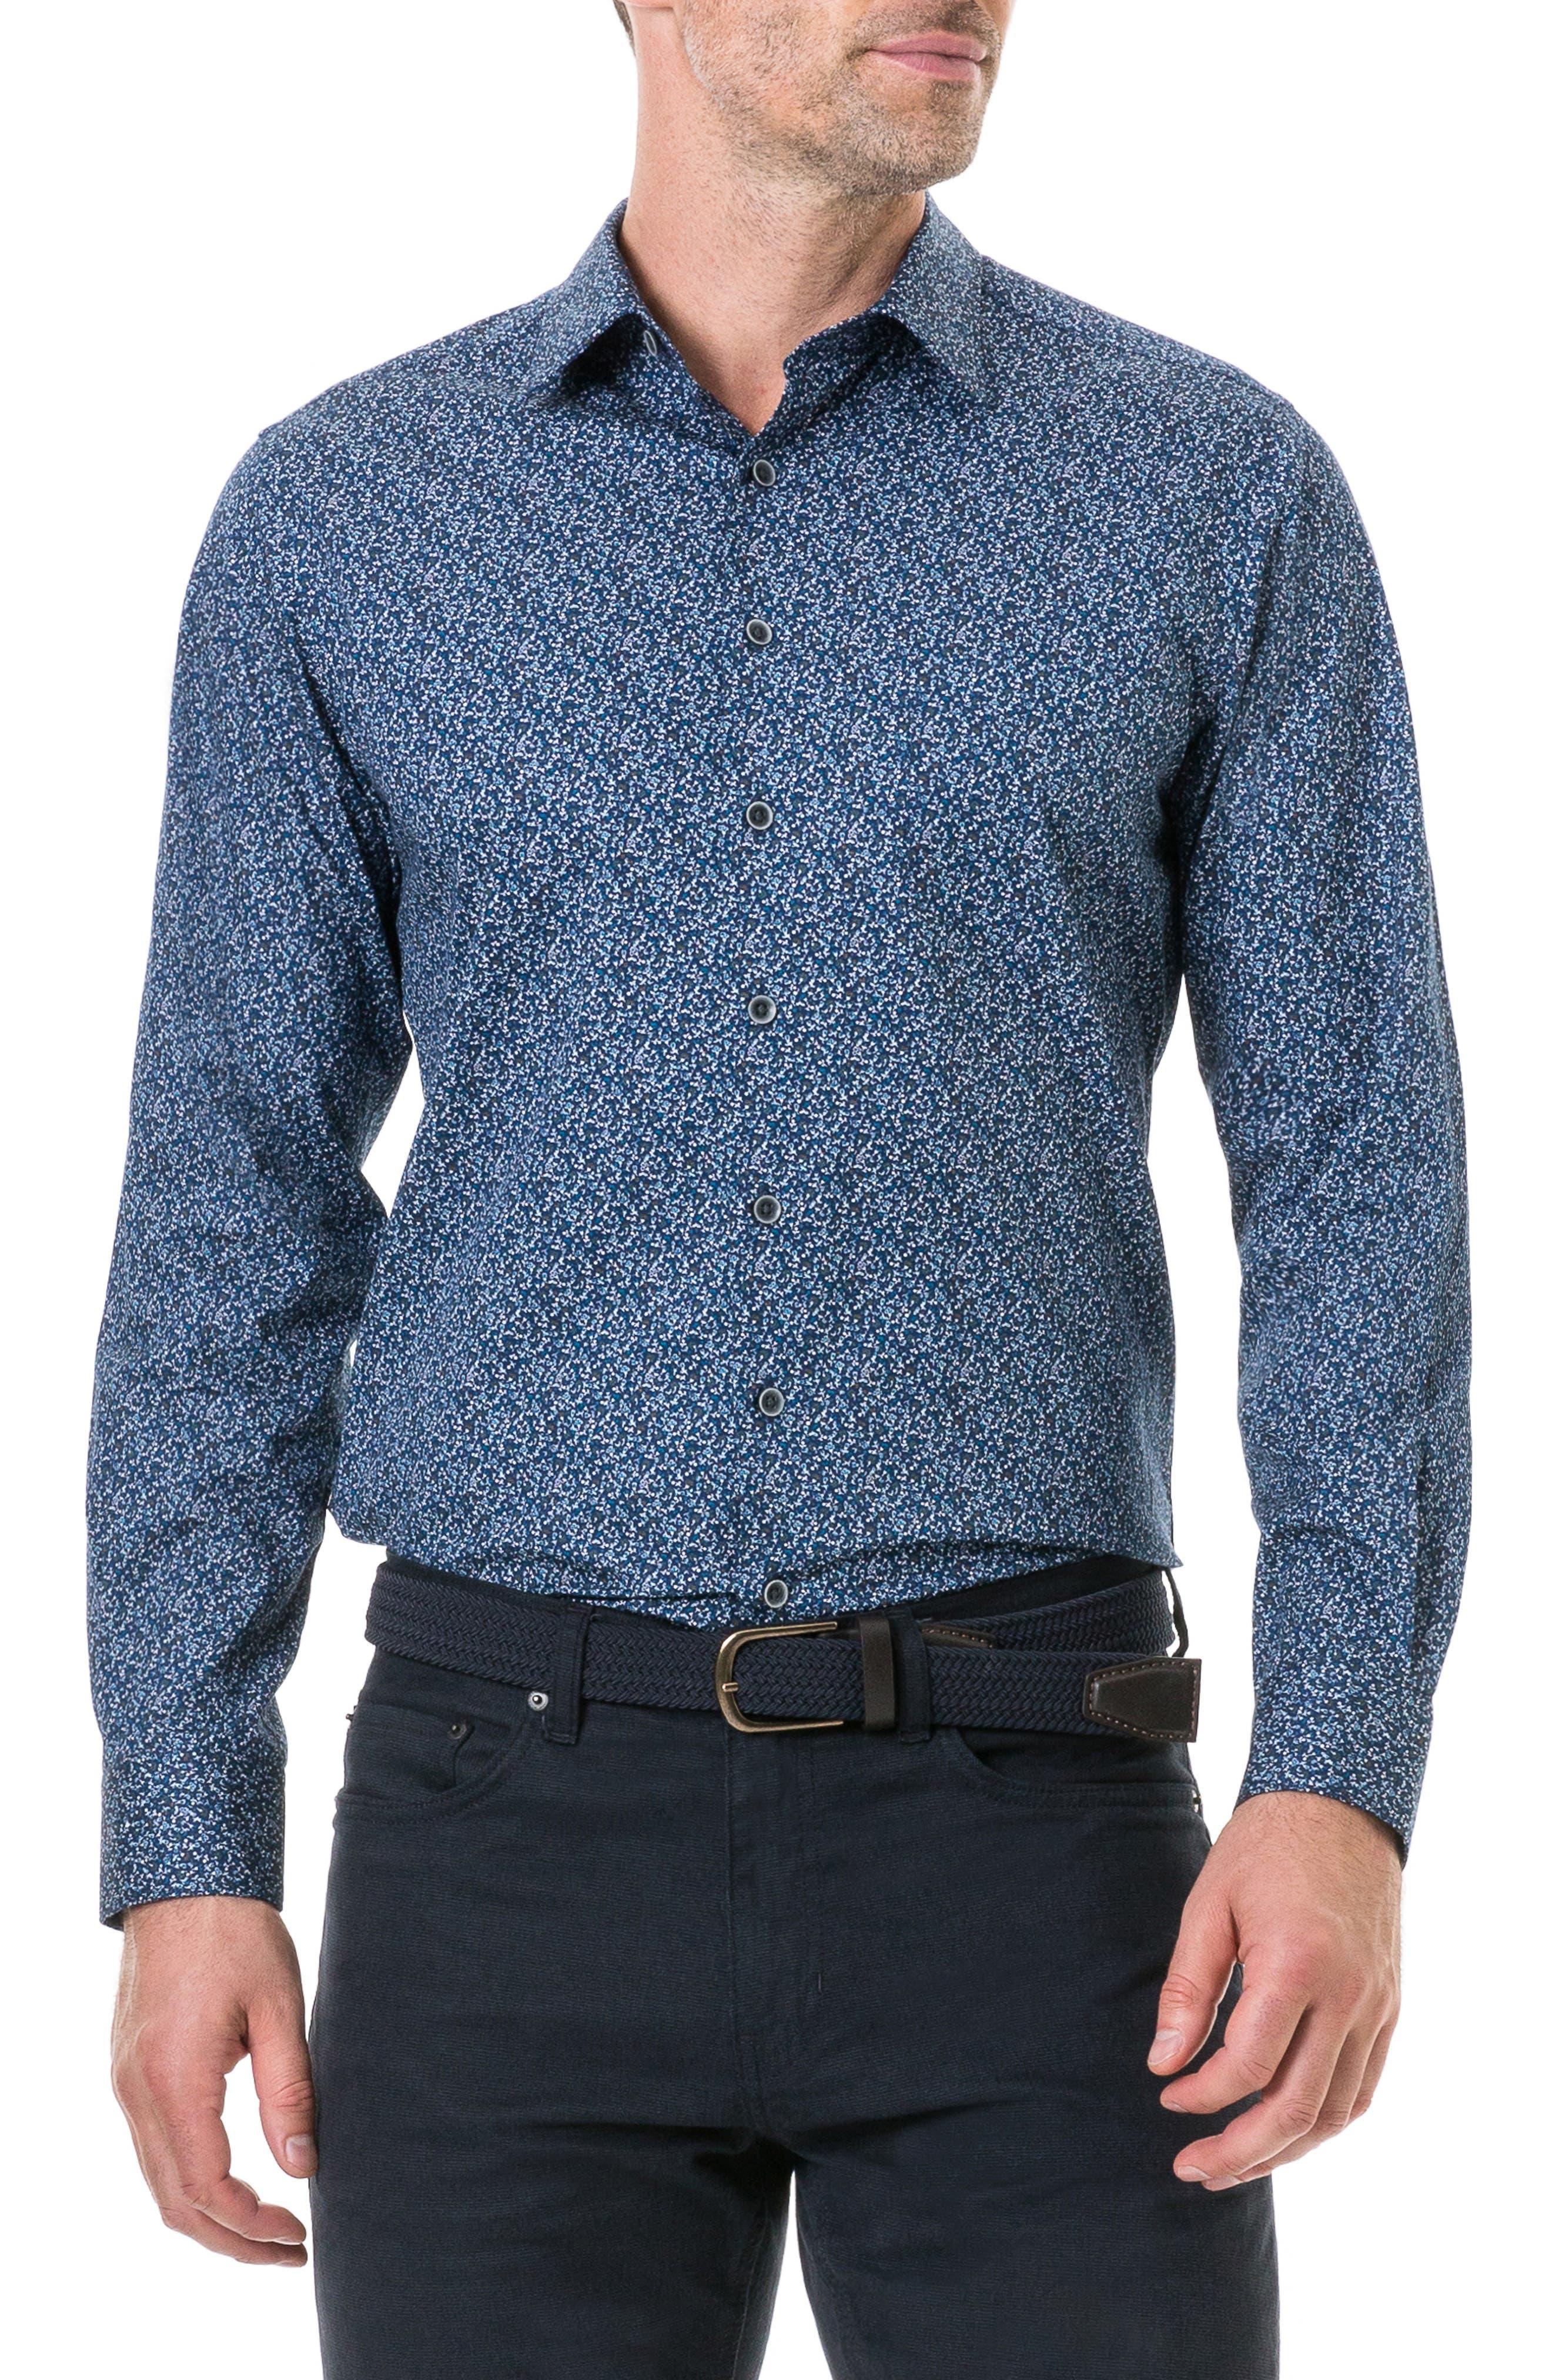 Scotland Street Regular Fit Floral Sport Shirt,                             Main thumbnail 1, color,                             NAVY